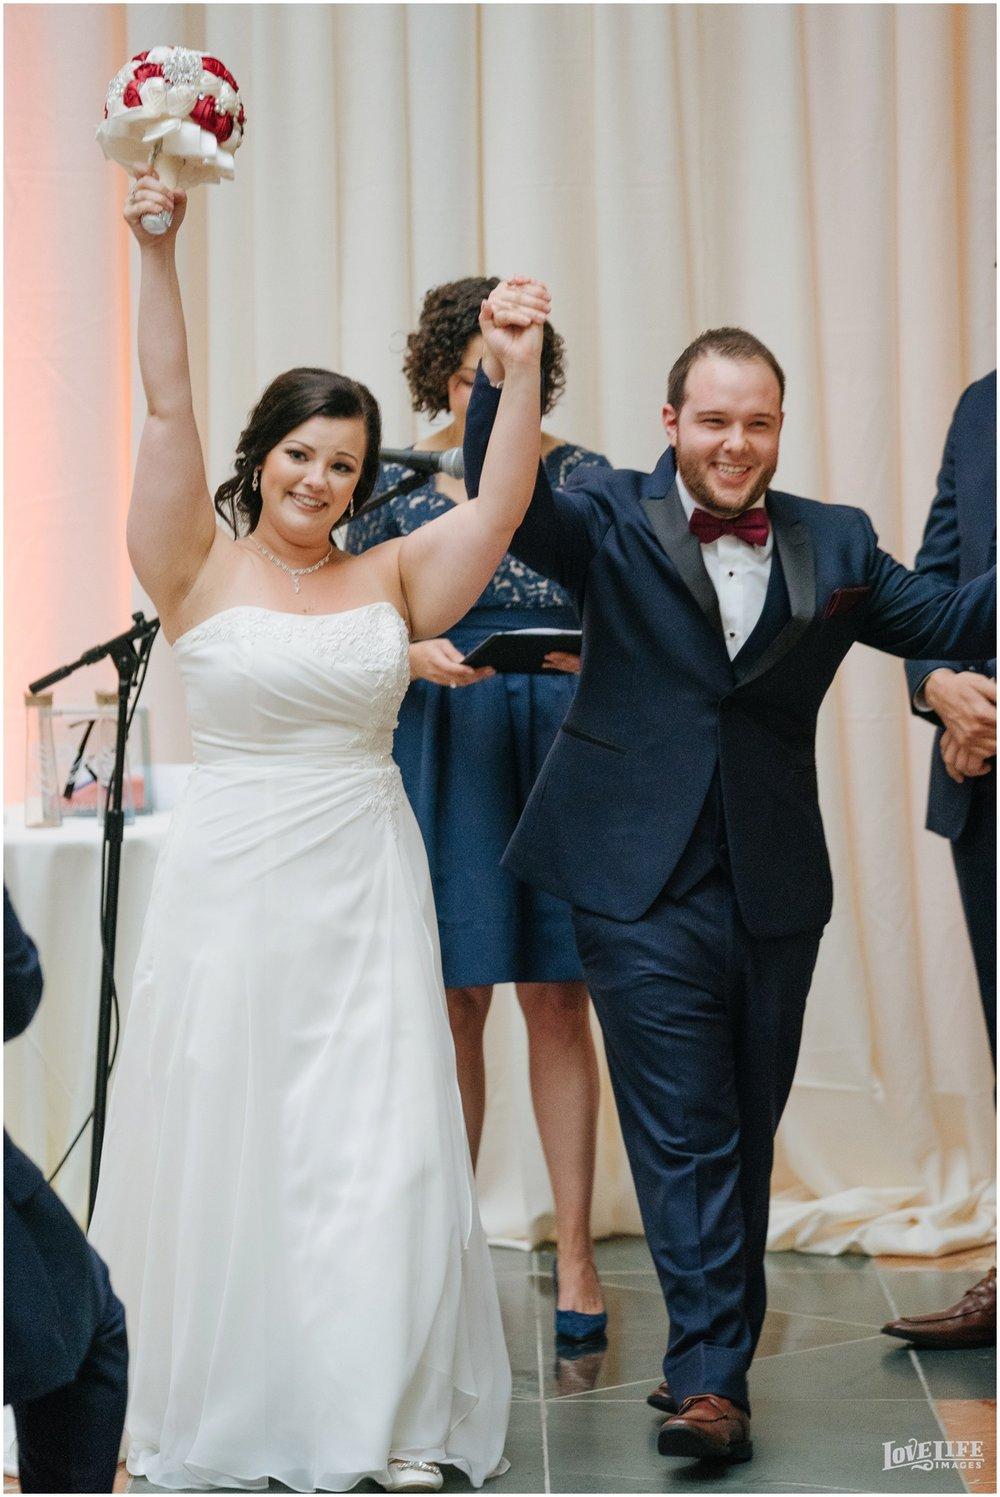 Society Fair VA Wedding newlyweds.jpg